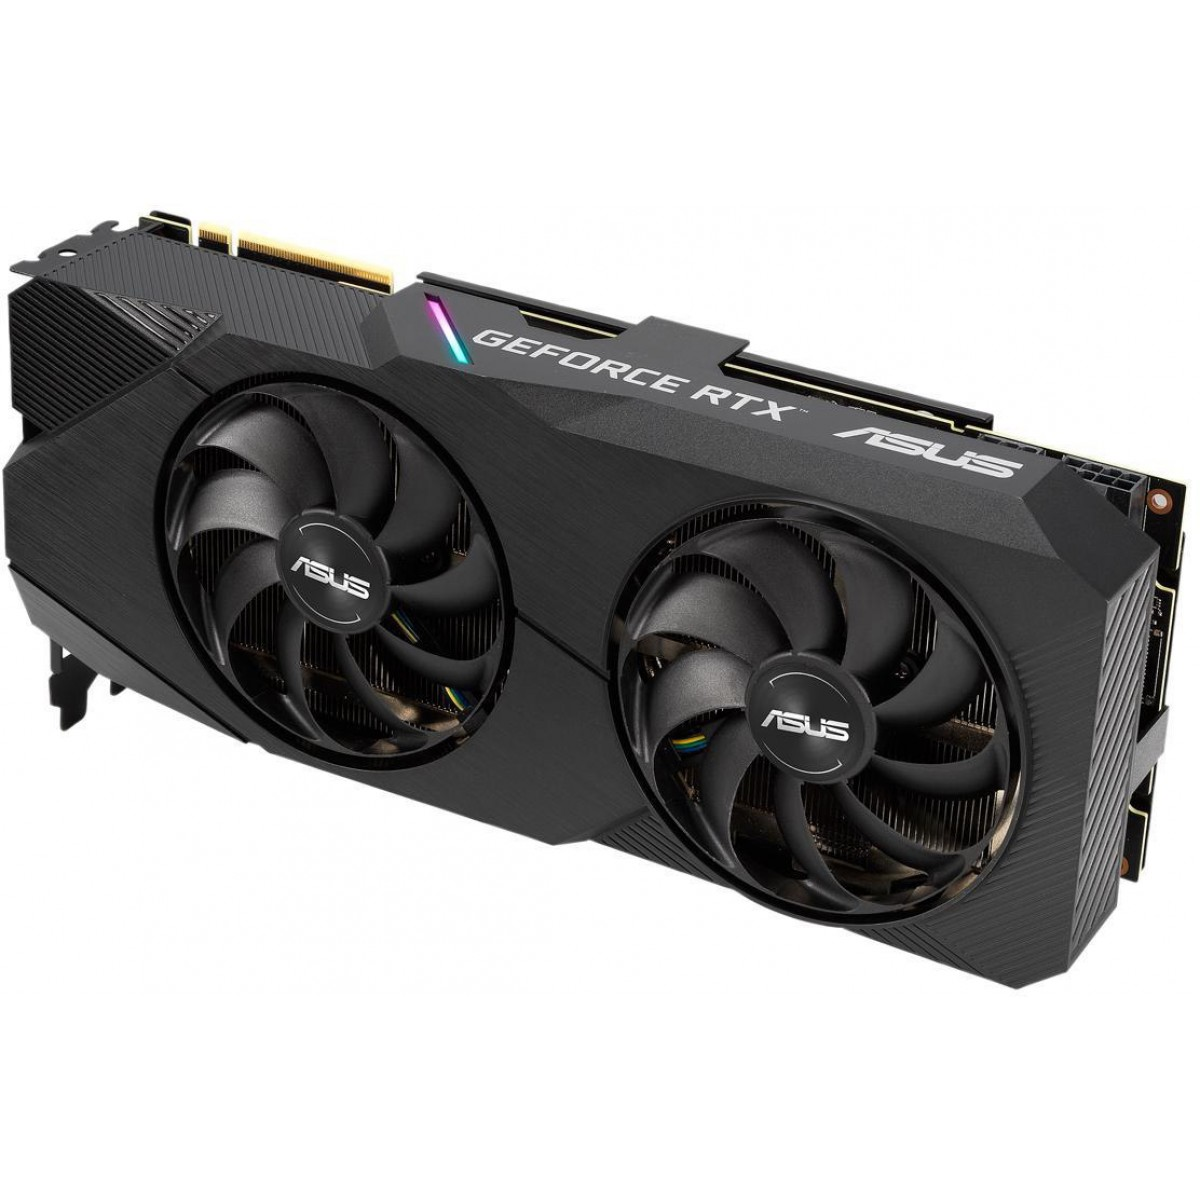 Placa de Vídeo Asus GeForce RTX 2080 Super Dual EVO, 8GB GDDR6, 256Bit, DUAL-RTX2080S-8G-EVO